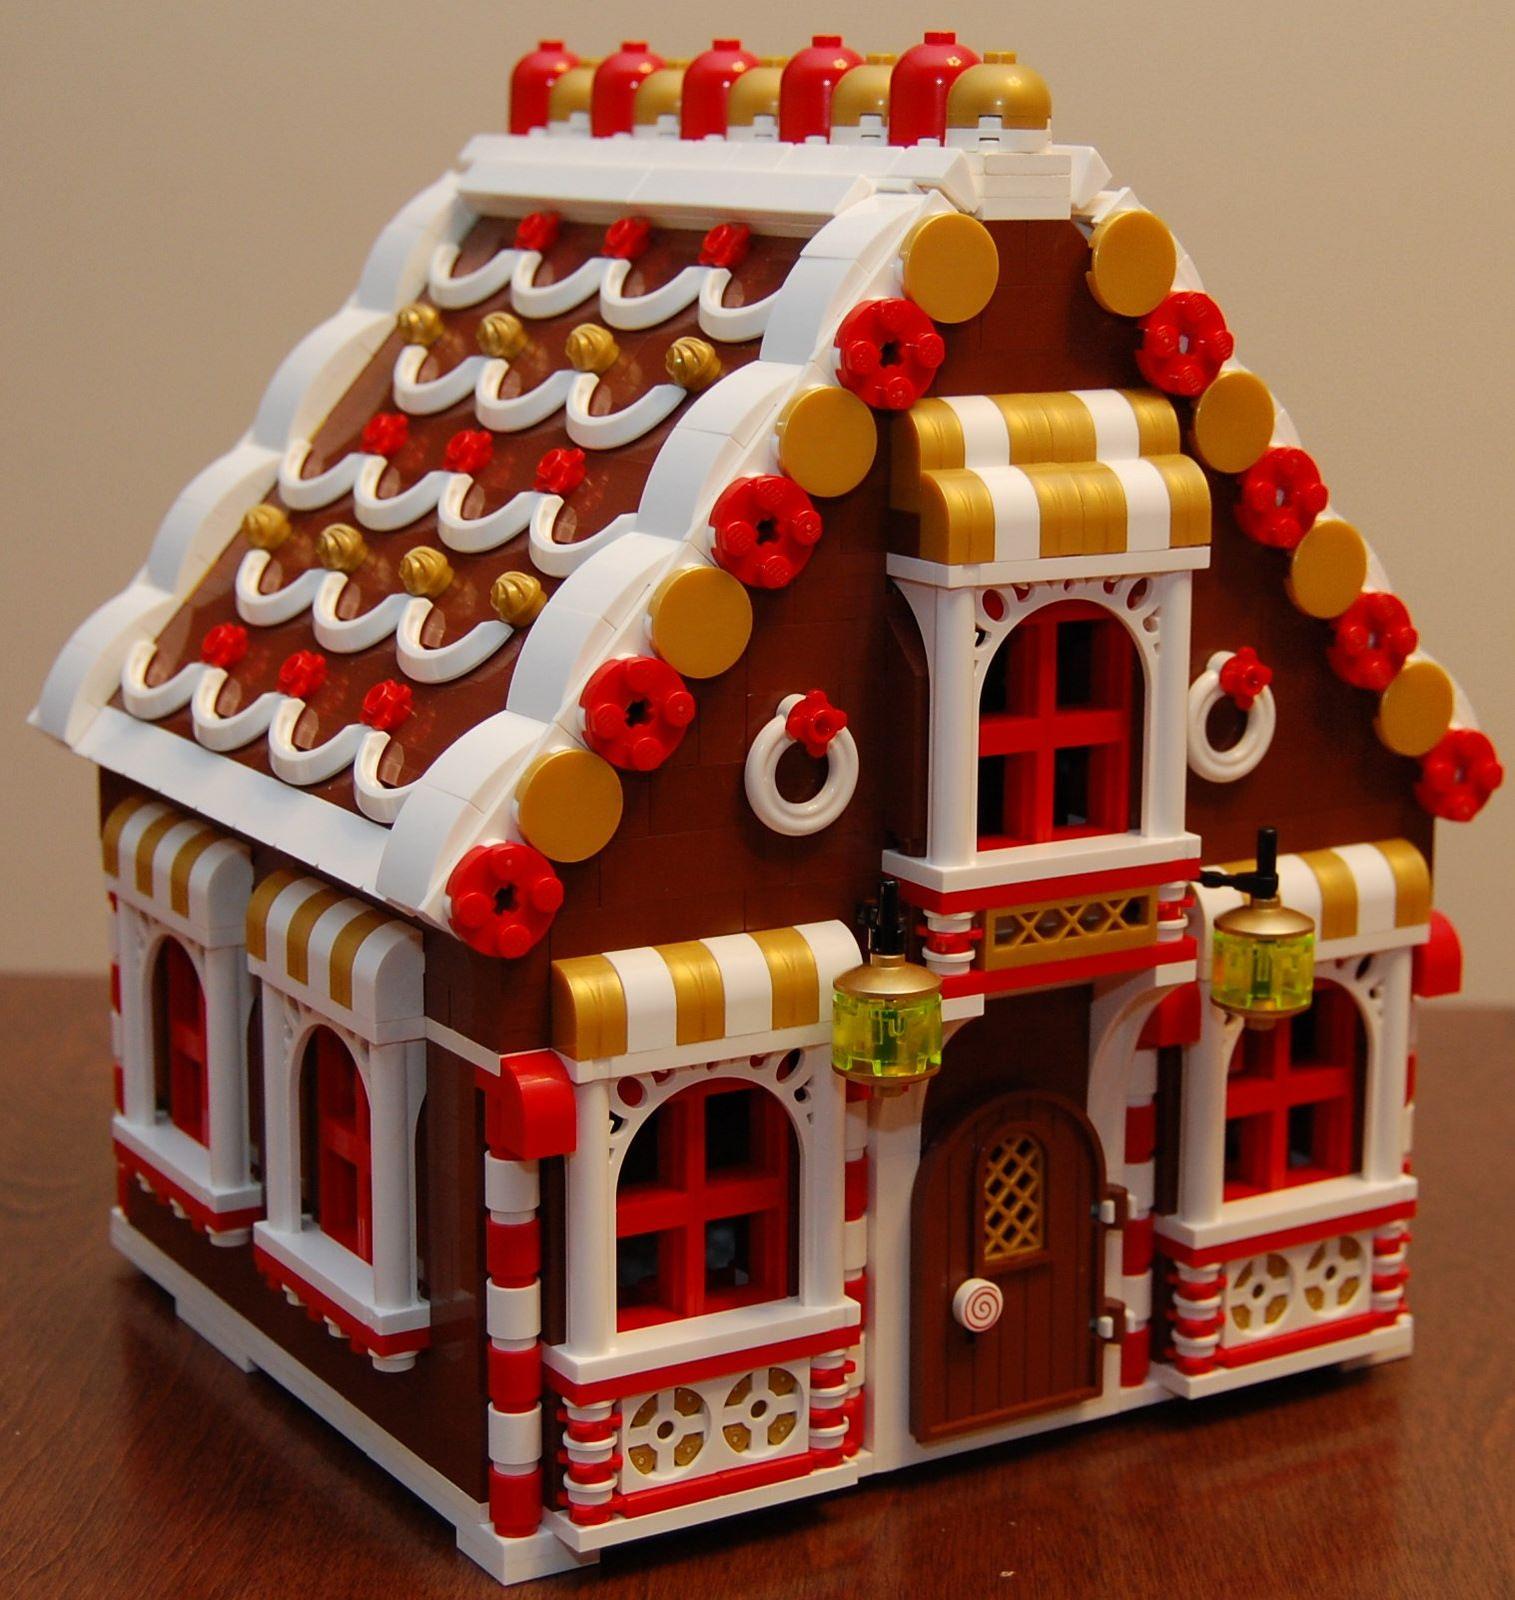 Gingerbread House-Village de Noël Custom Design-Made with real LEGO